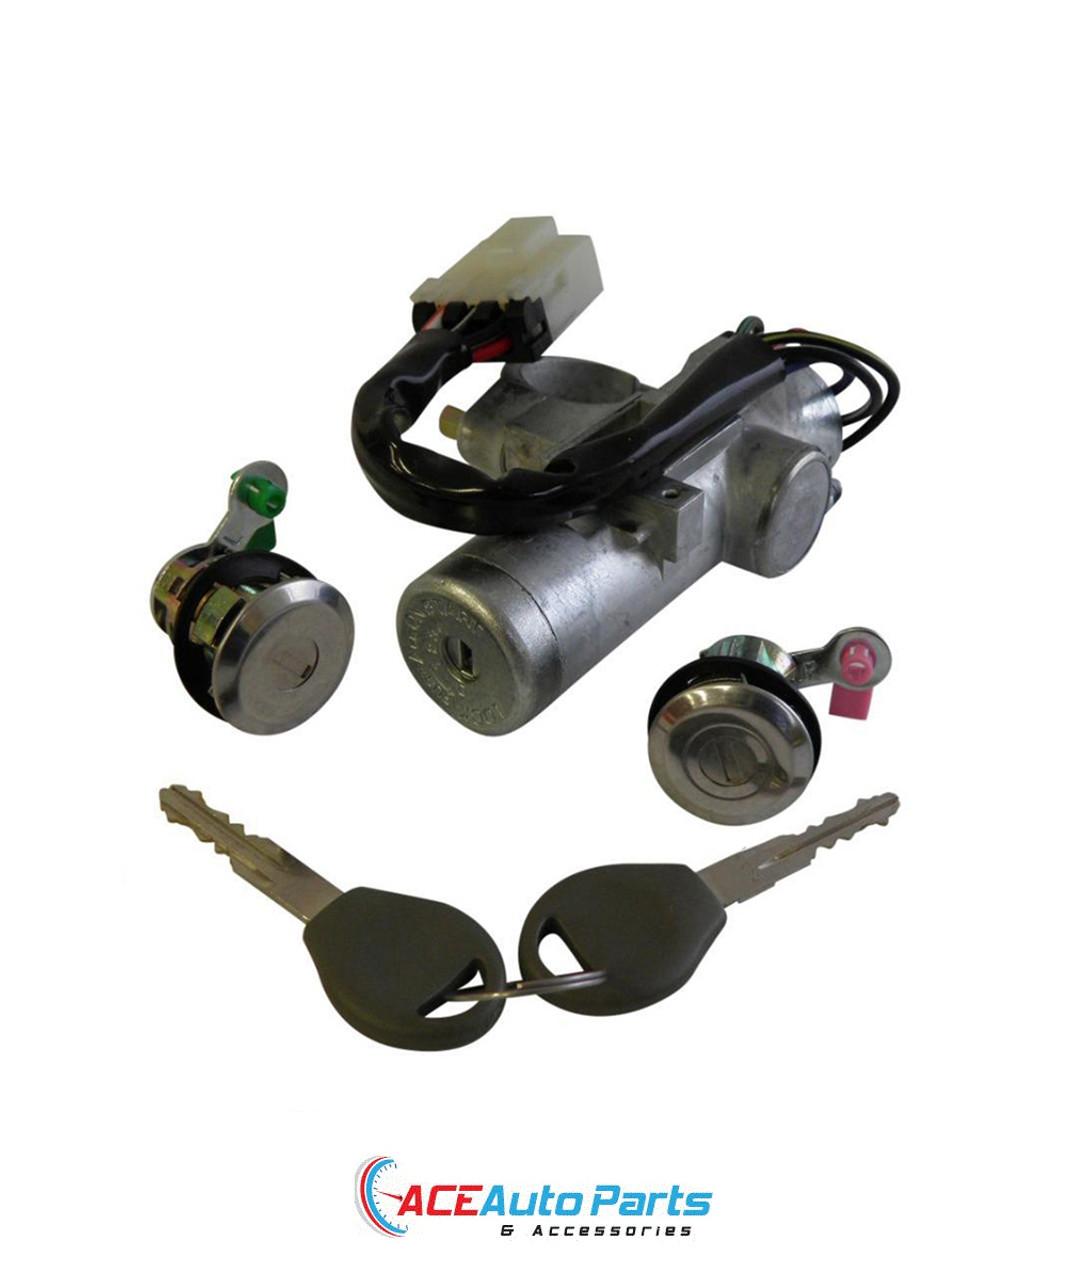 Ignition barrel switch door locks set For Nissan Navara D22.